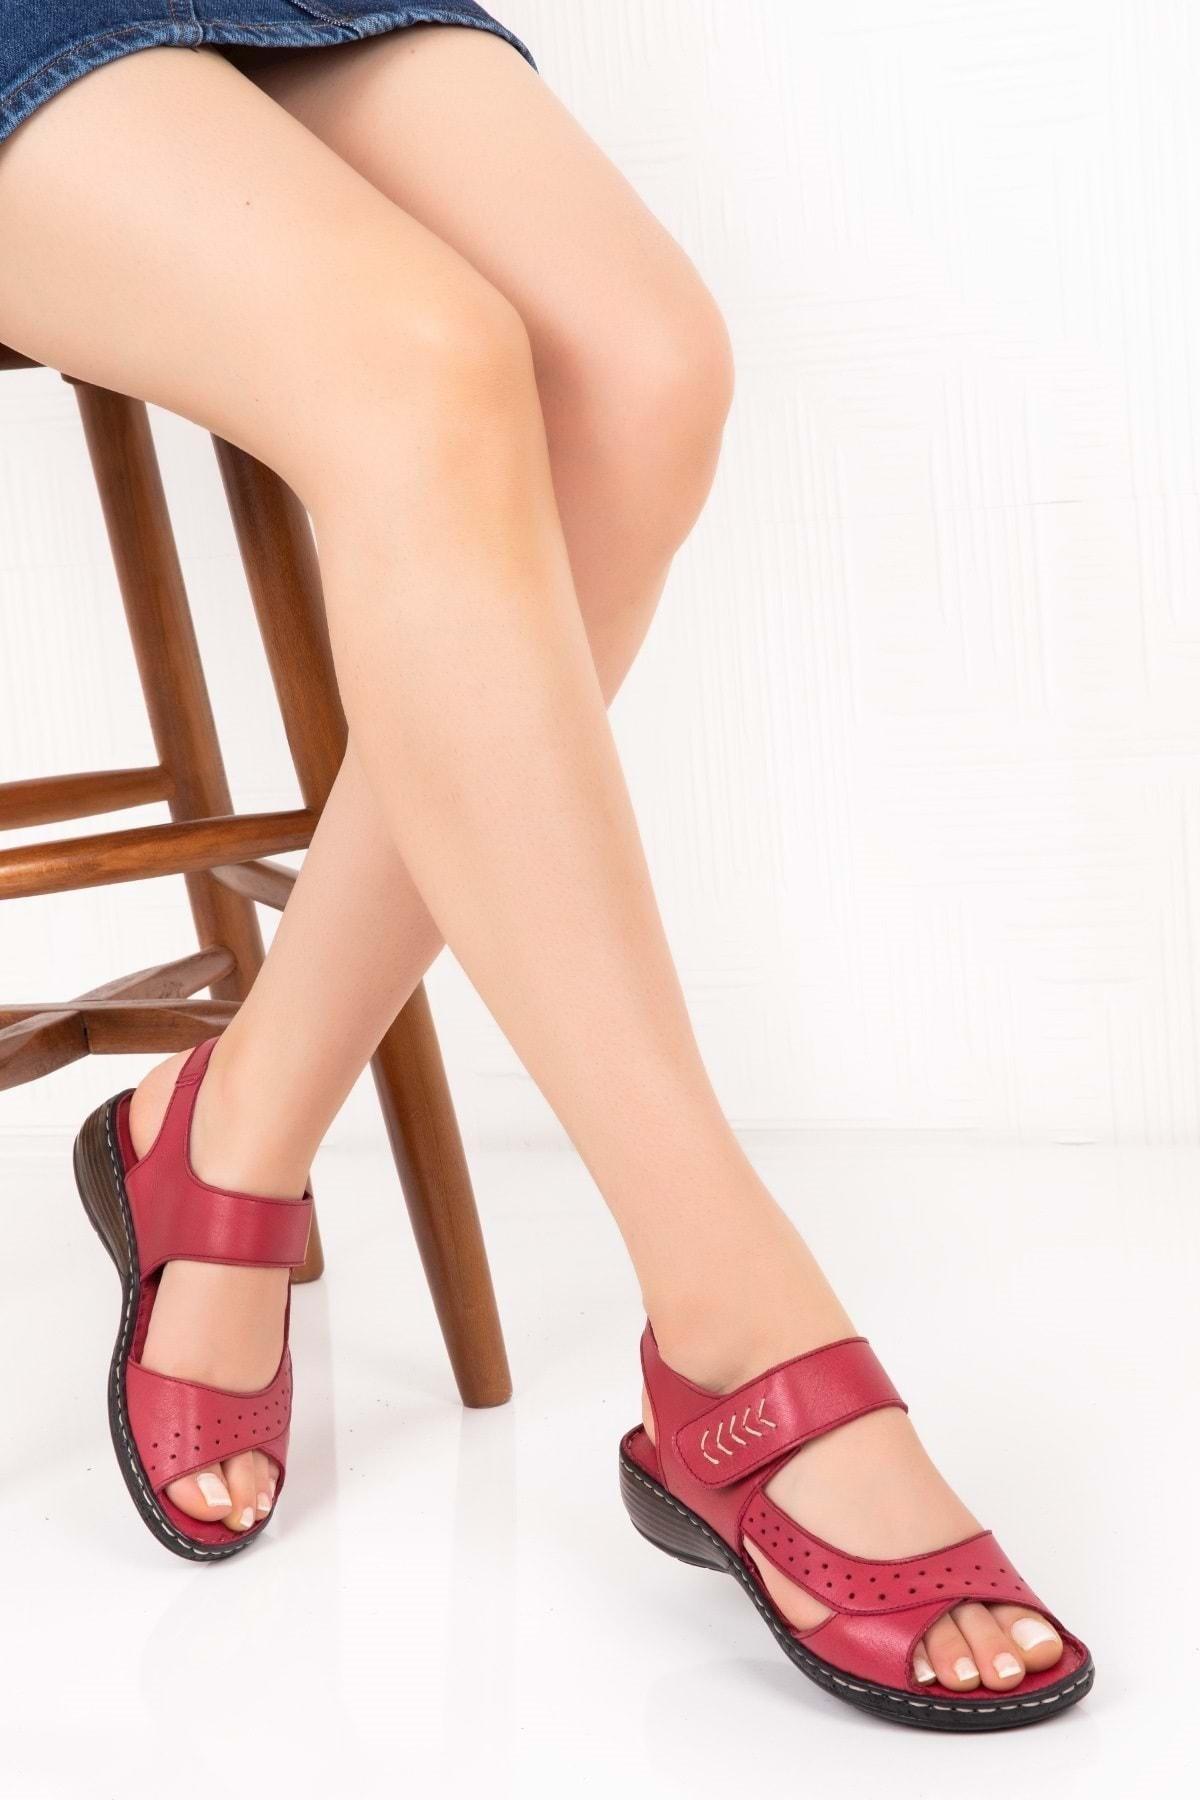 Gondol Deri Sandalet Bordo 37 Iz.036 1